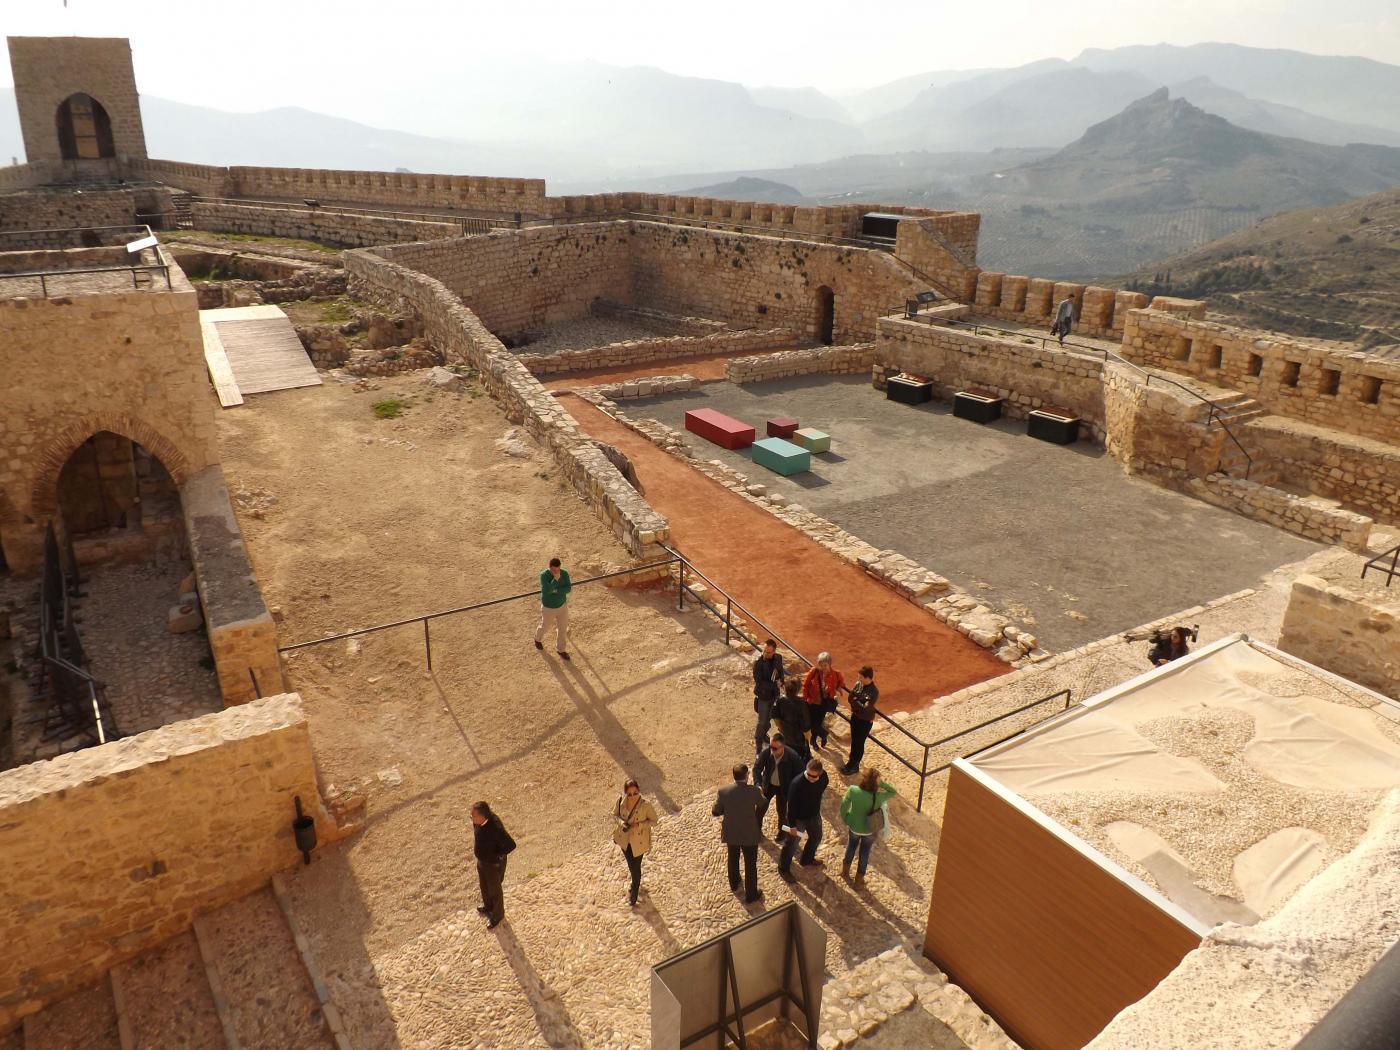 Imagen del interior del Castillo de Santa Catalina. Foto: Archivo